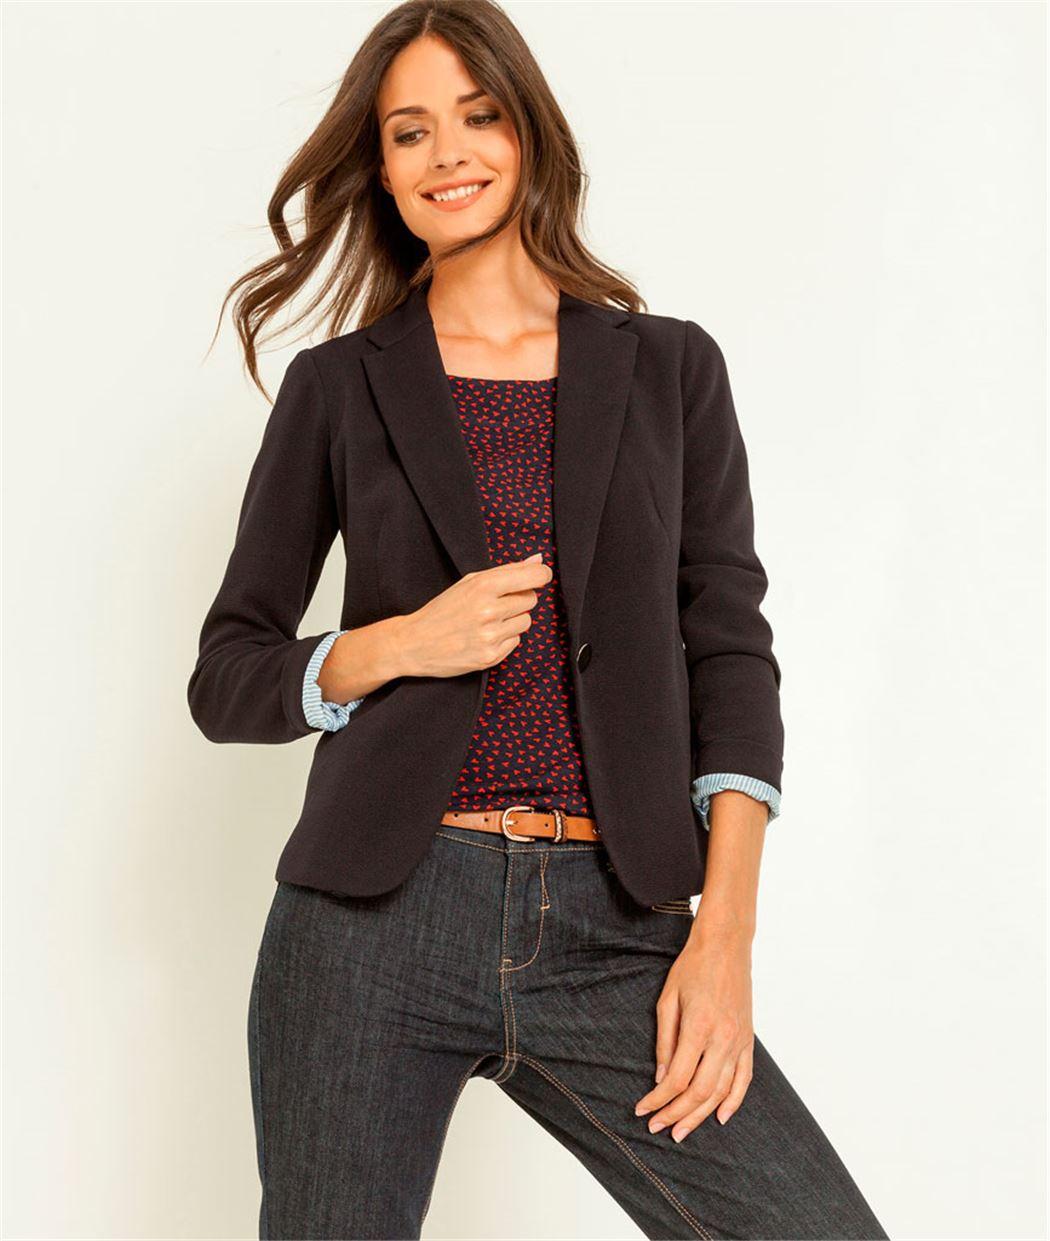 veste femme tailleur en maille marine grain de malice. Black Bedroom Furniture Sets. Home Design Ideas